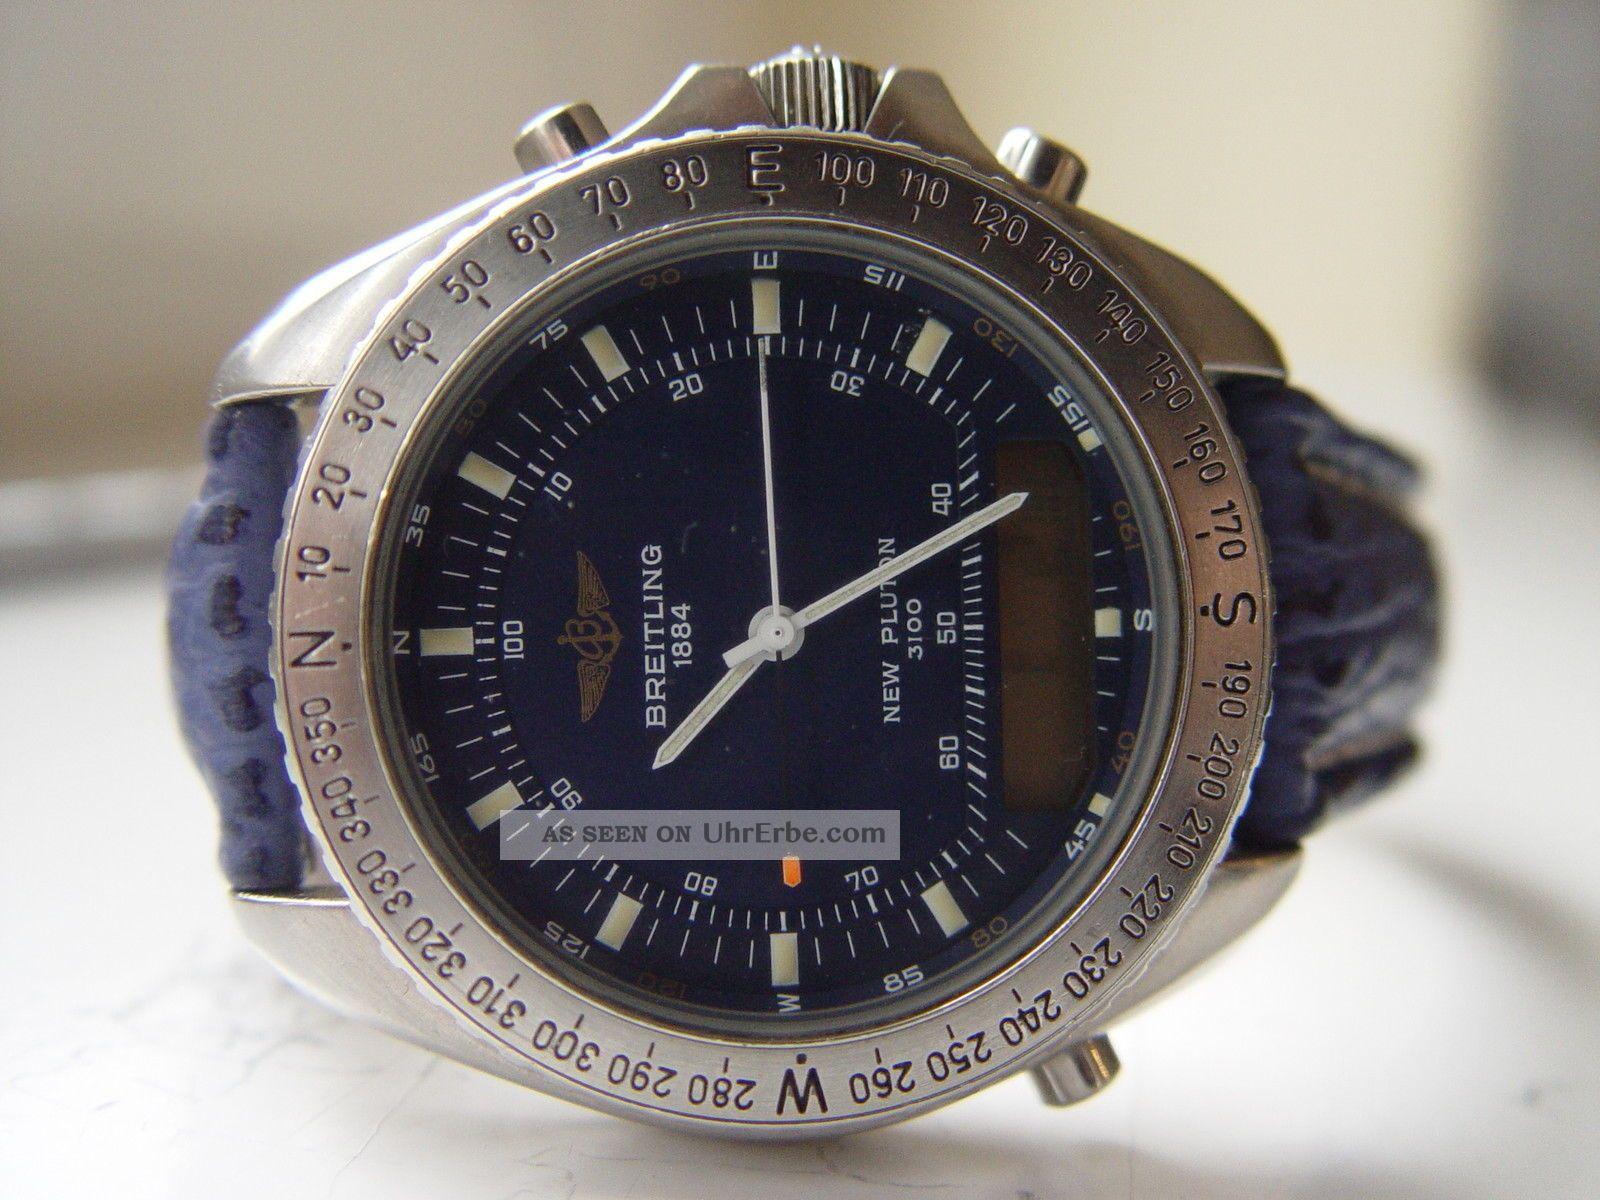 Breitling Pluton 3100 Armbanduhren Bild